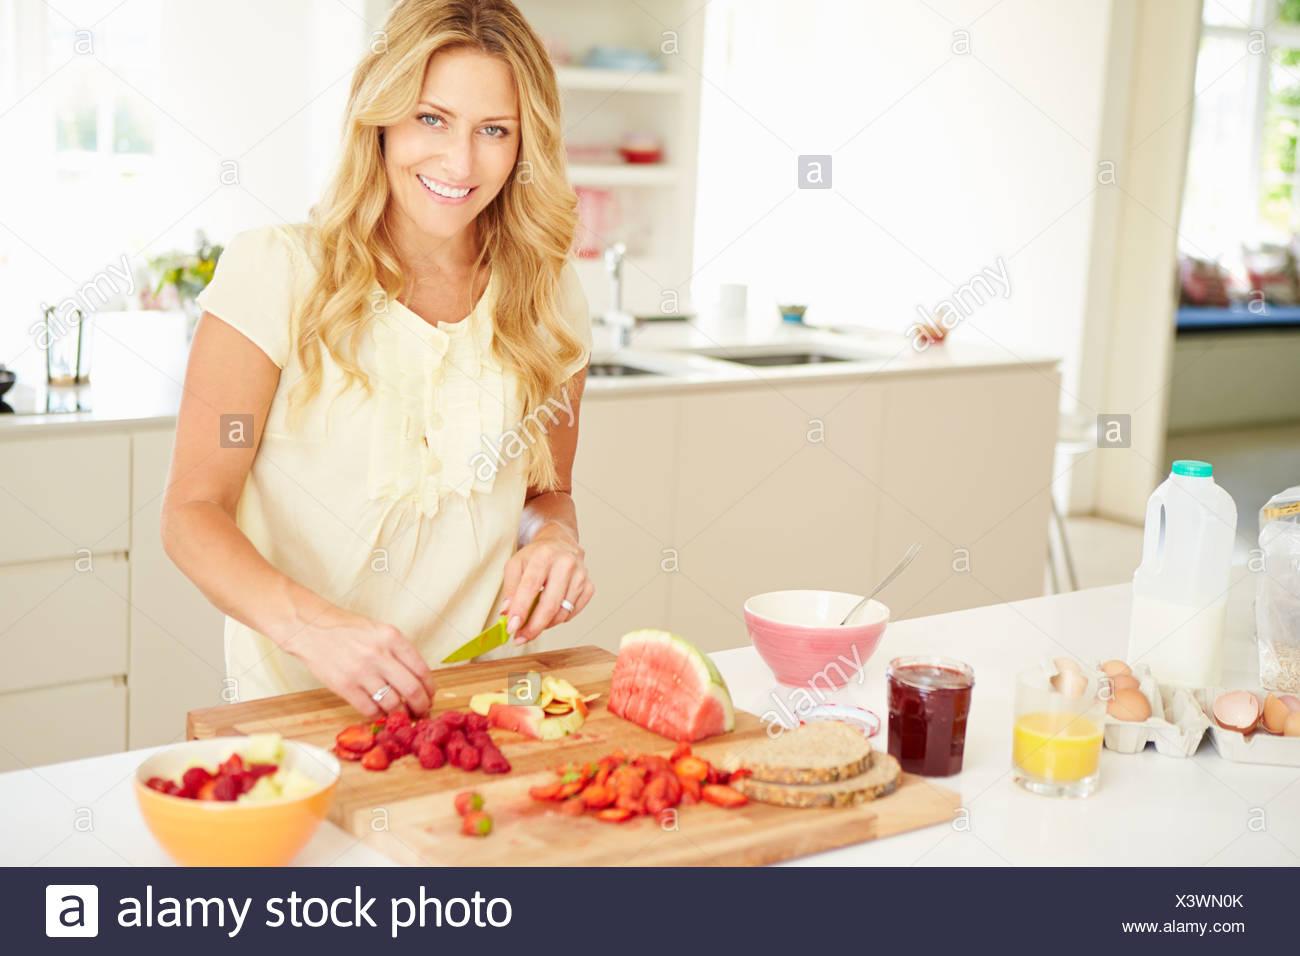 Woman Preparing Healthy Breakfast In Kitchen - Stock Image